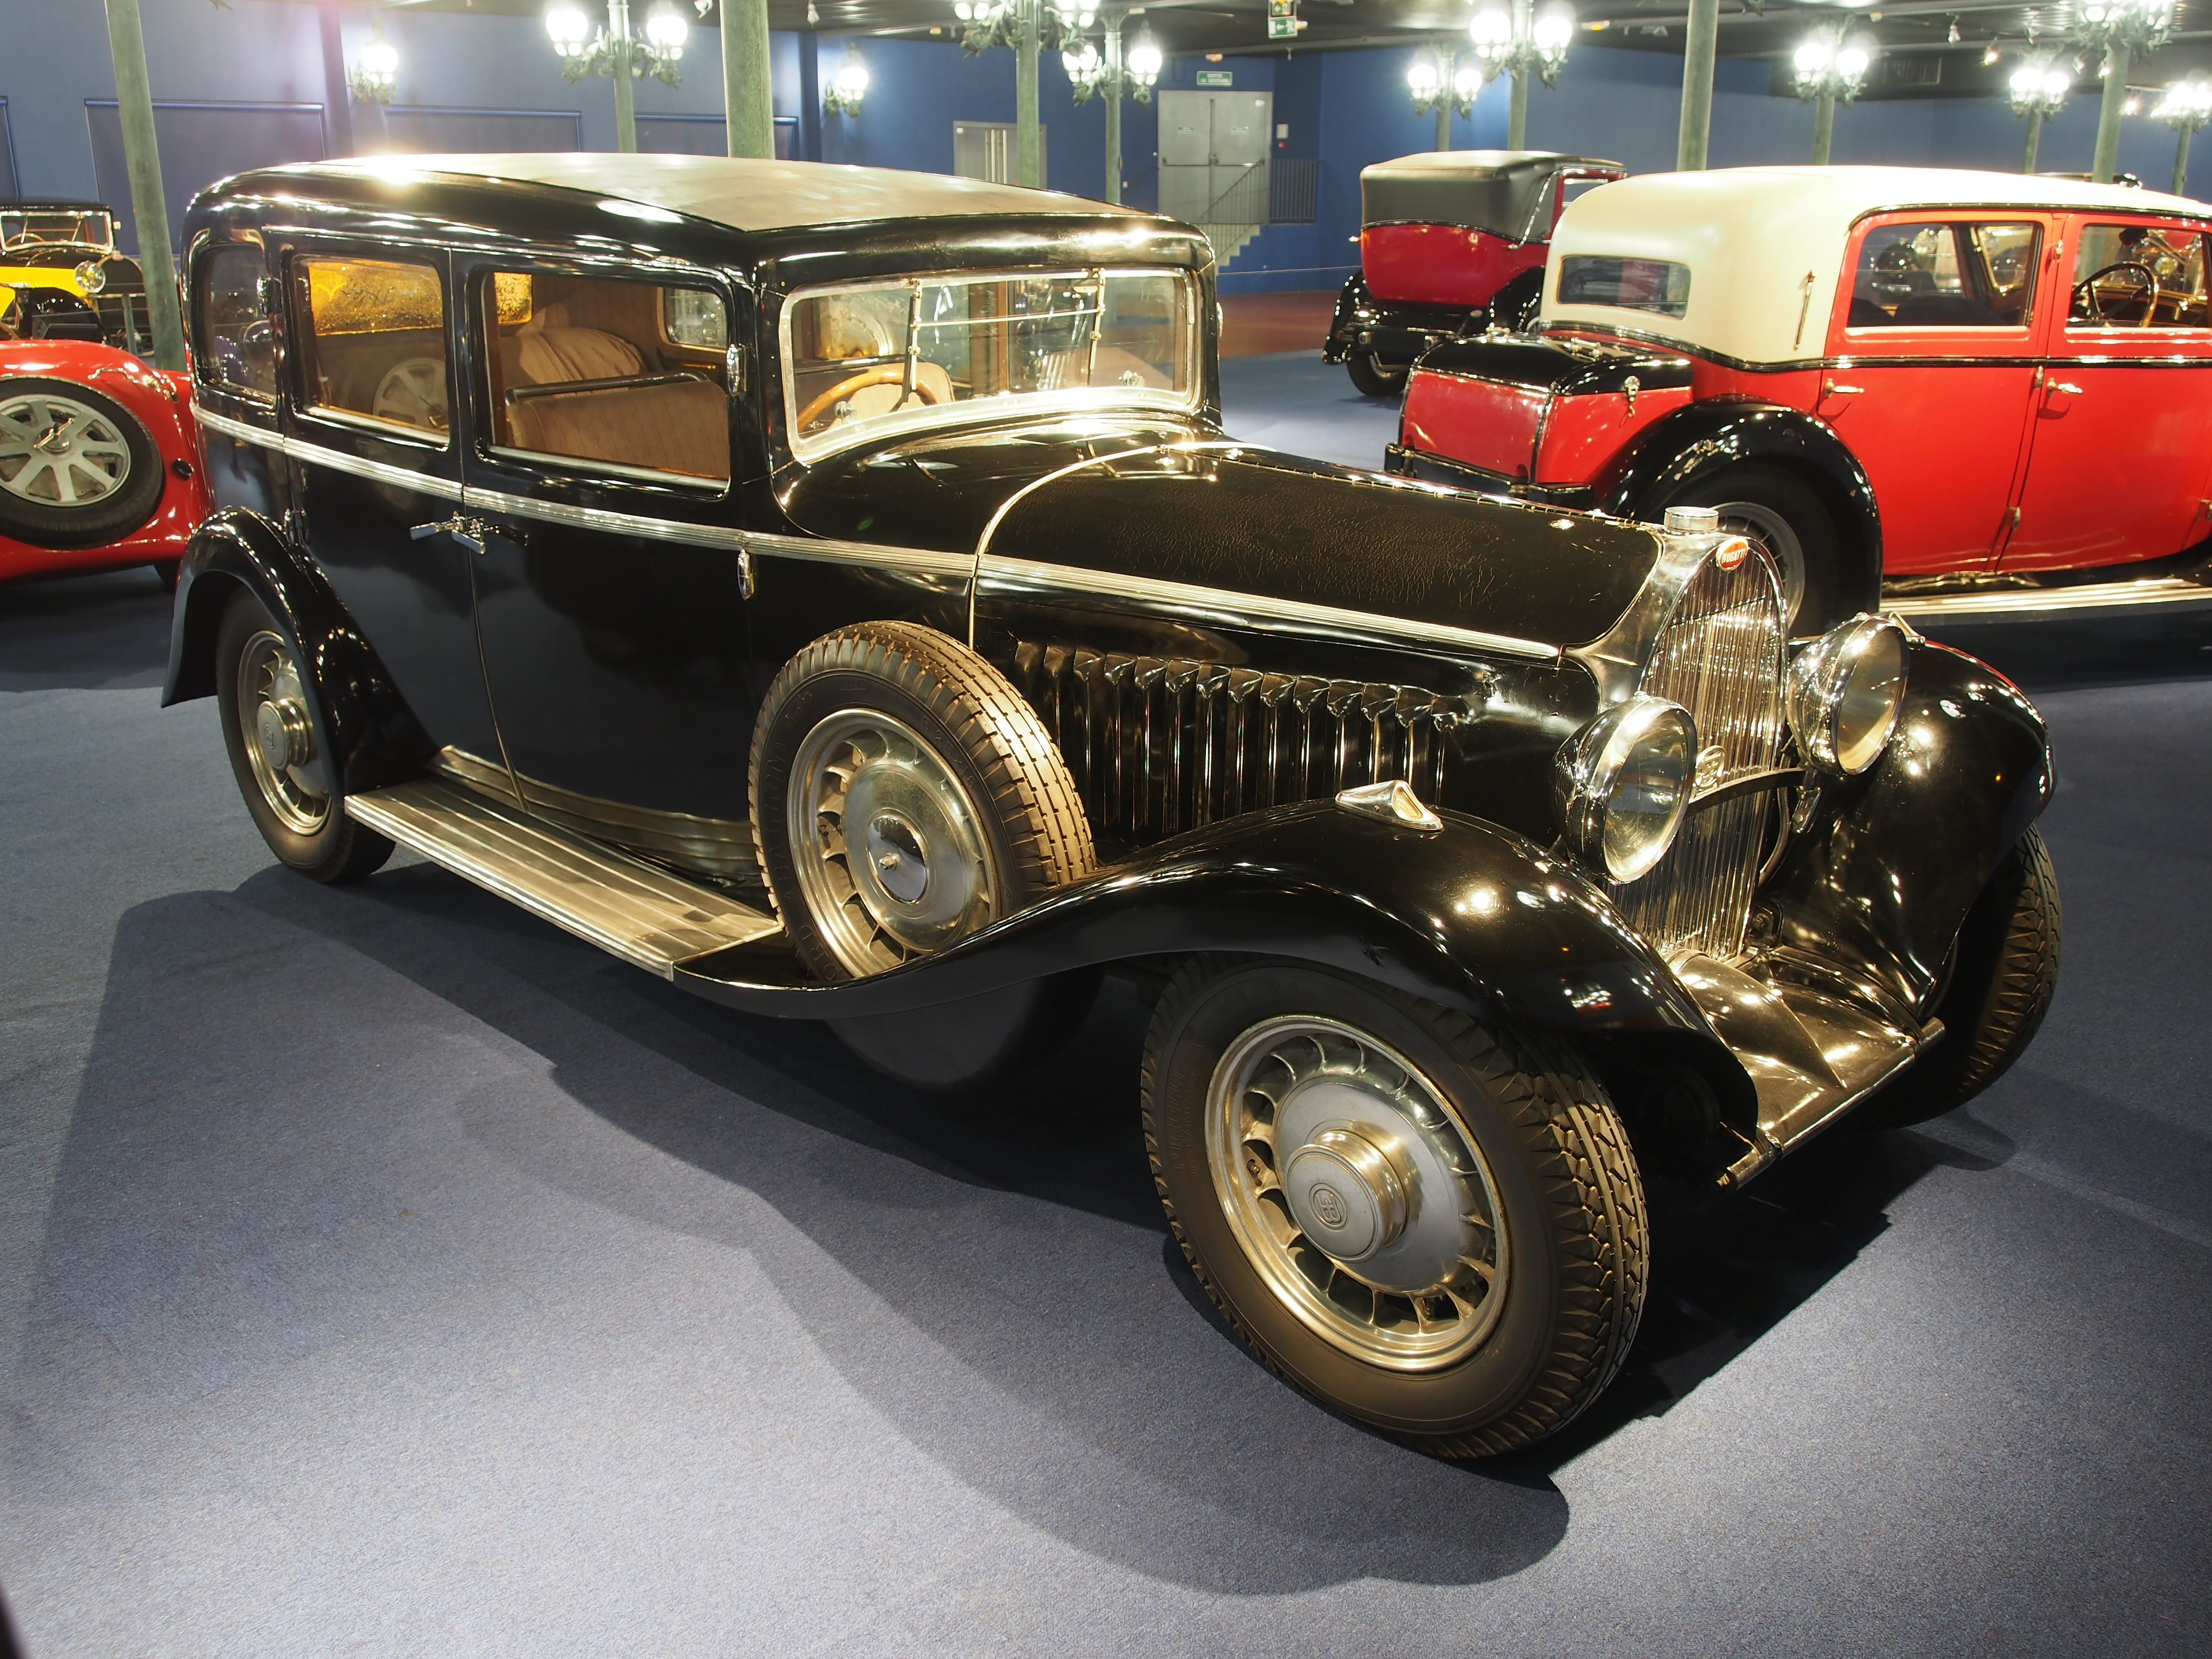 File:1934 Bugatti Type 49 Limousine photo 1.JPG